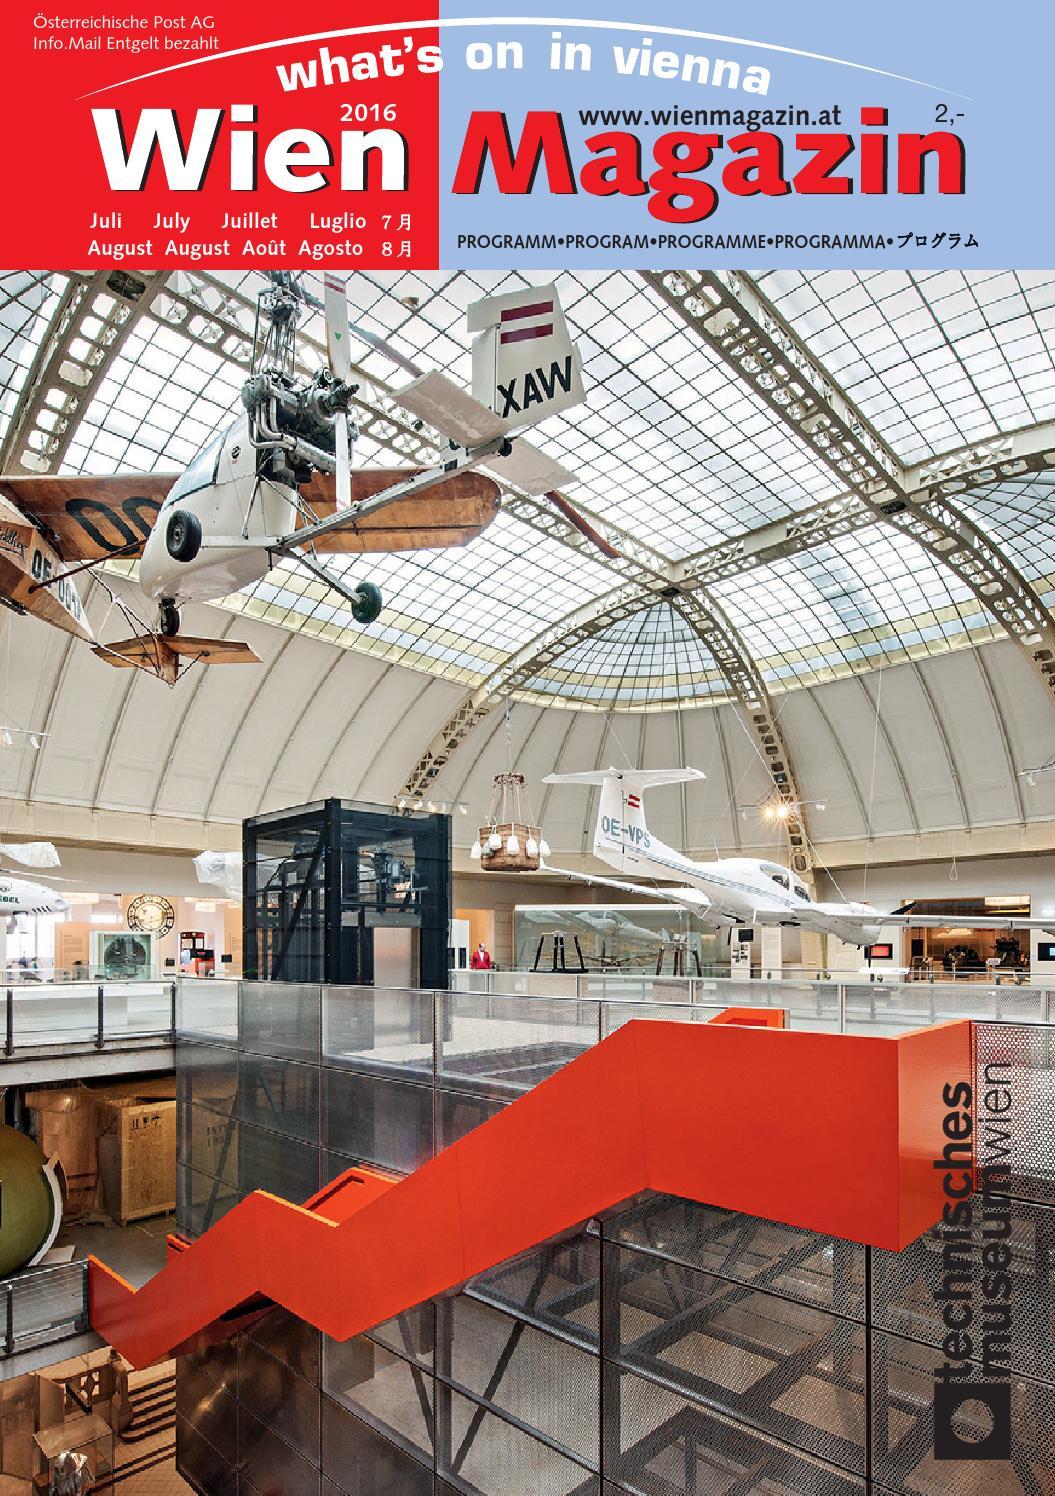 Wien Magazin 8+8 8 by Waltraud Edelmayer   issuu